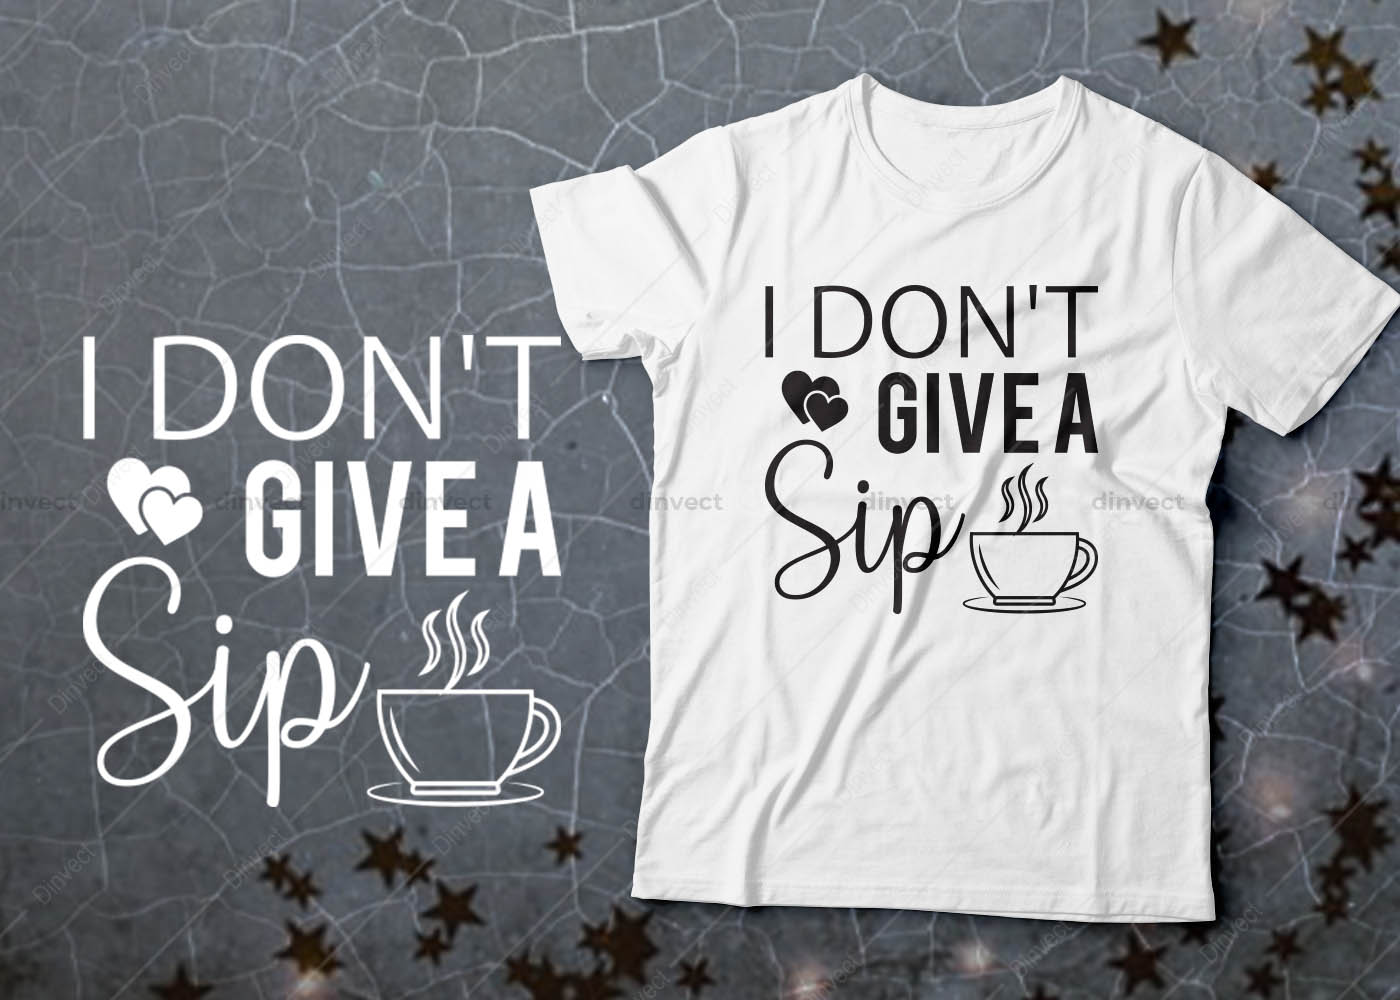 Coffee SVG, Coffee Bundle Svg, Coffee Mug Svg, Funny Coffee Quotes SVG, Mug Design Svg, Coffee Quote - Coffee 2 -